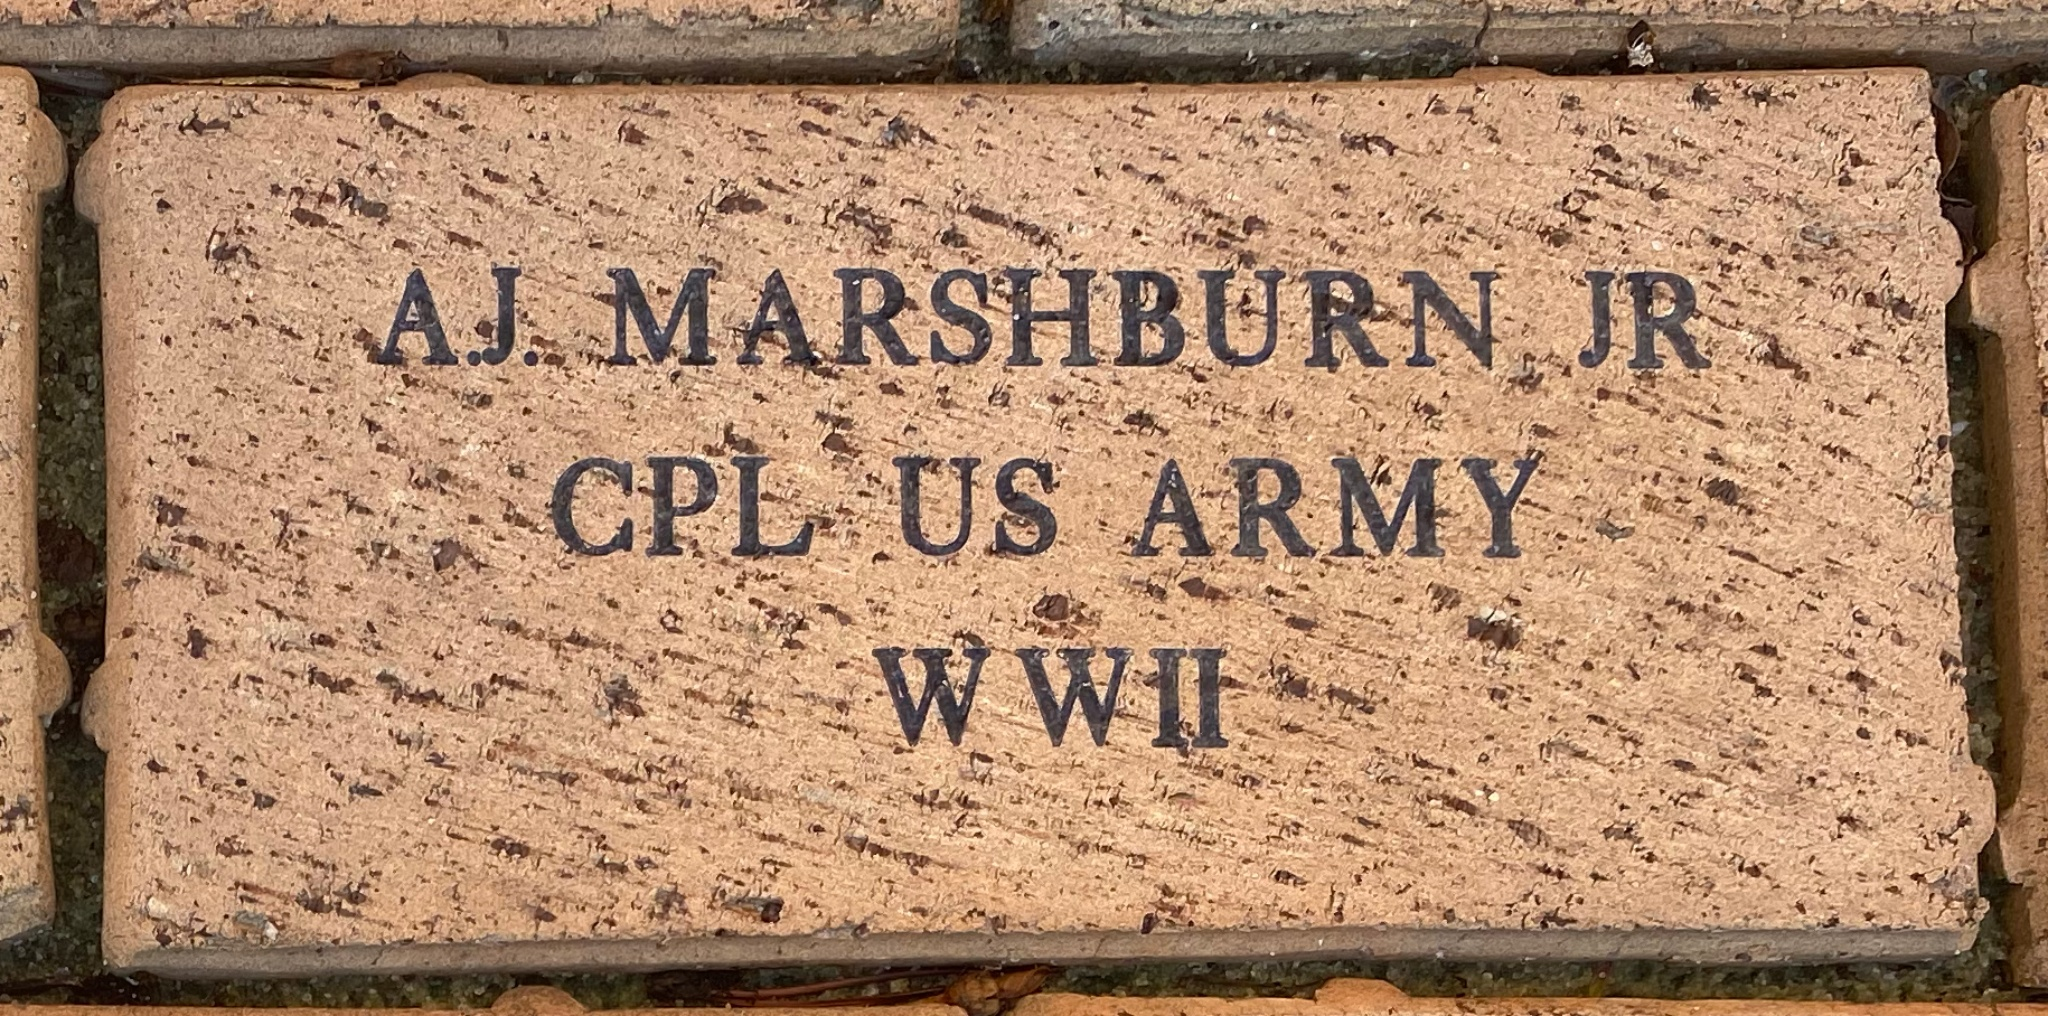 A.J. MARSHBURN JR CPL US ARMY WWII